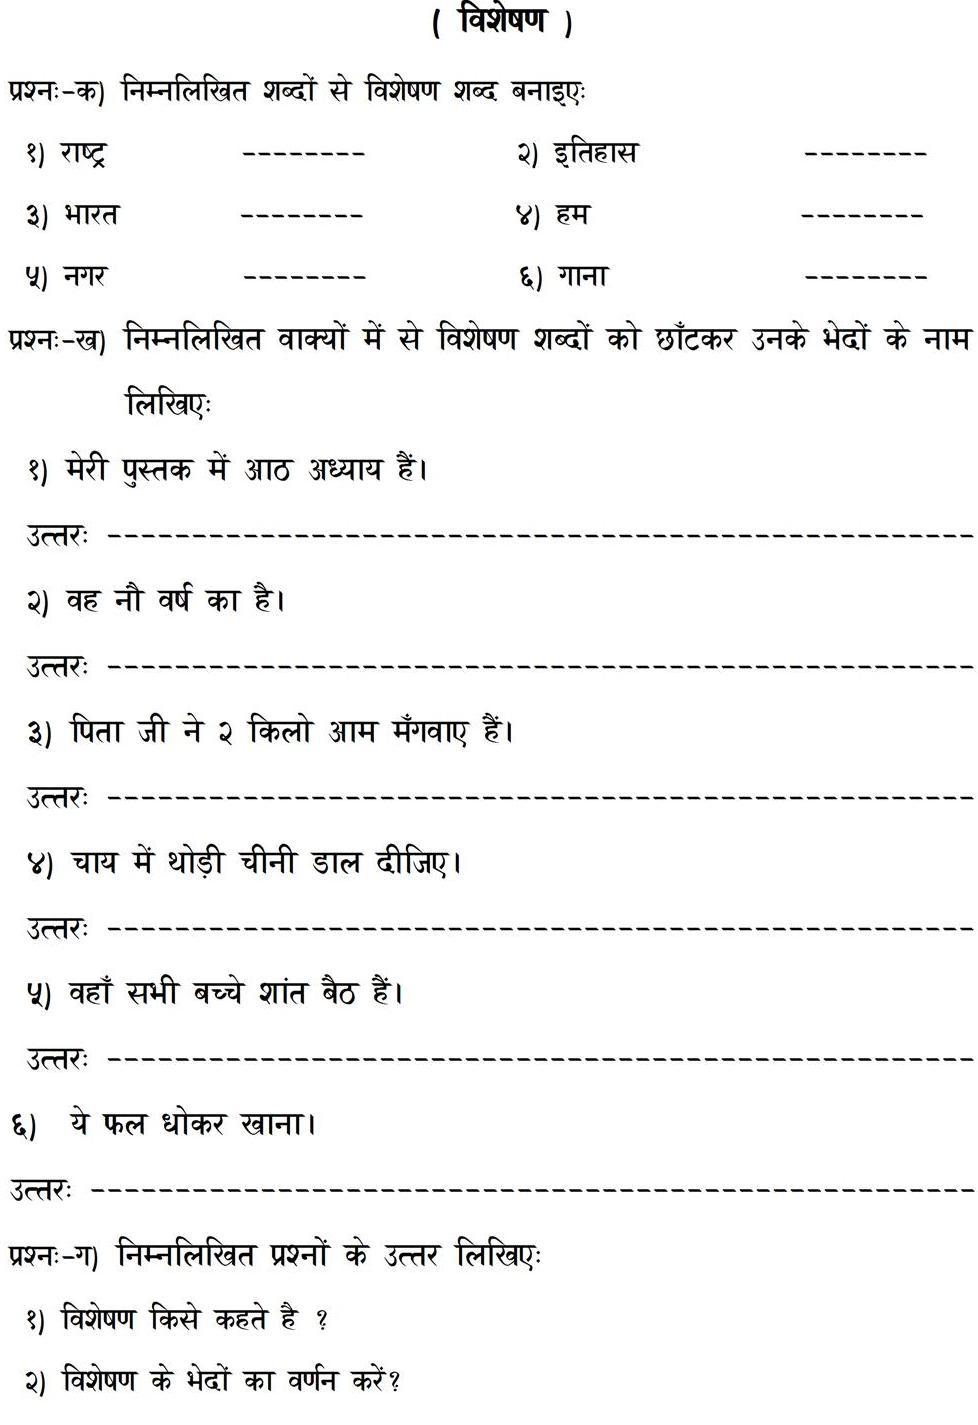 Worksheet Of Visheshan